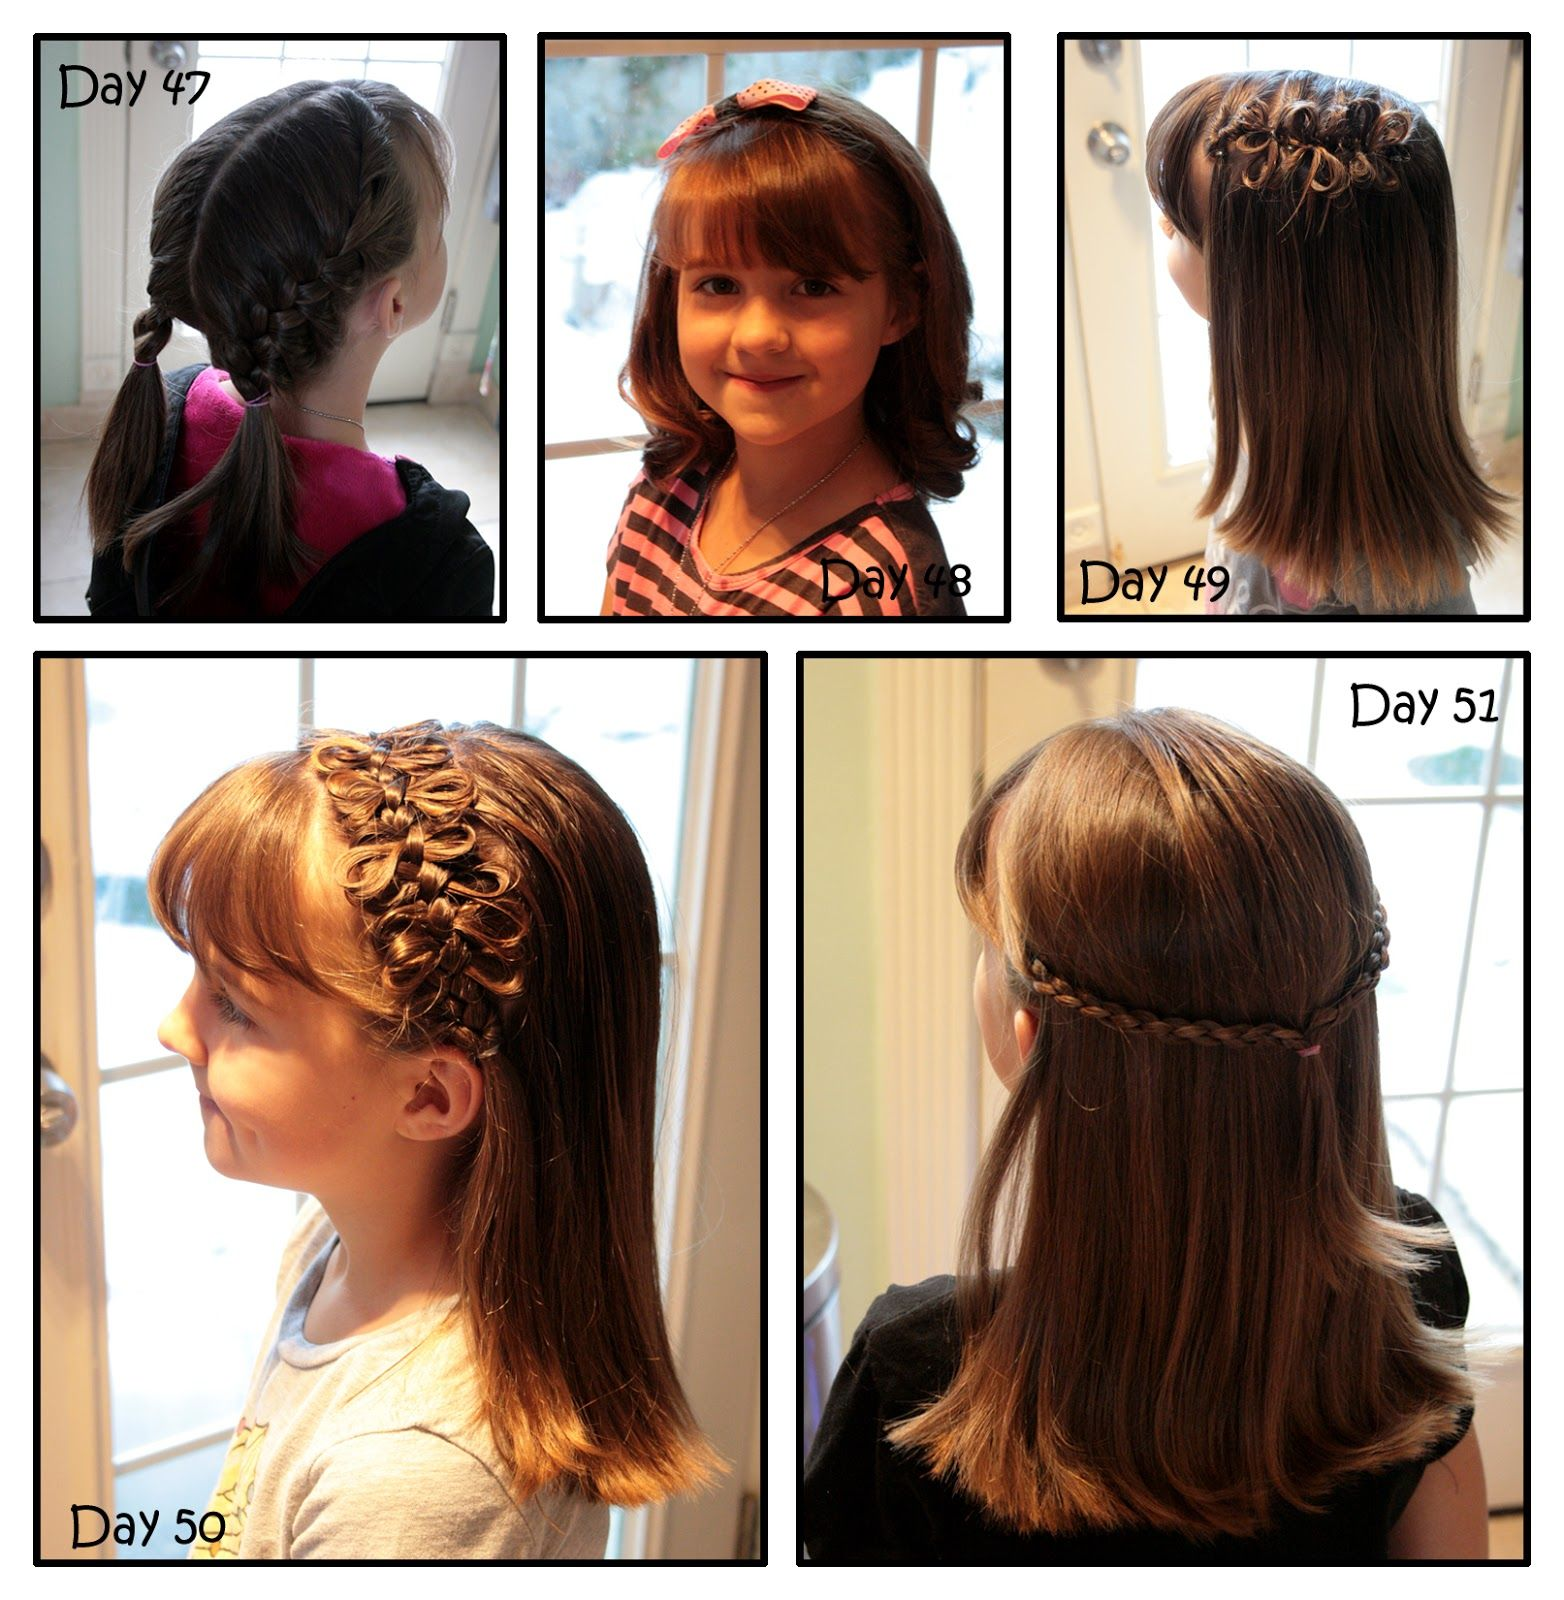 Girly Do Hairstyles By Jenn Days 47 51 Hair Styles Little Girl Hairstyles Girl Hairstyles